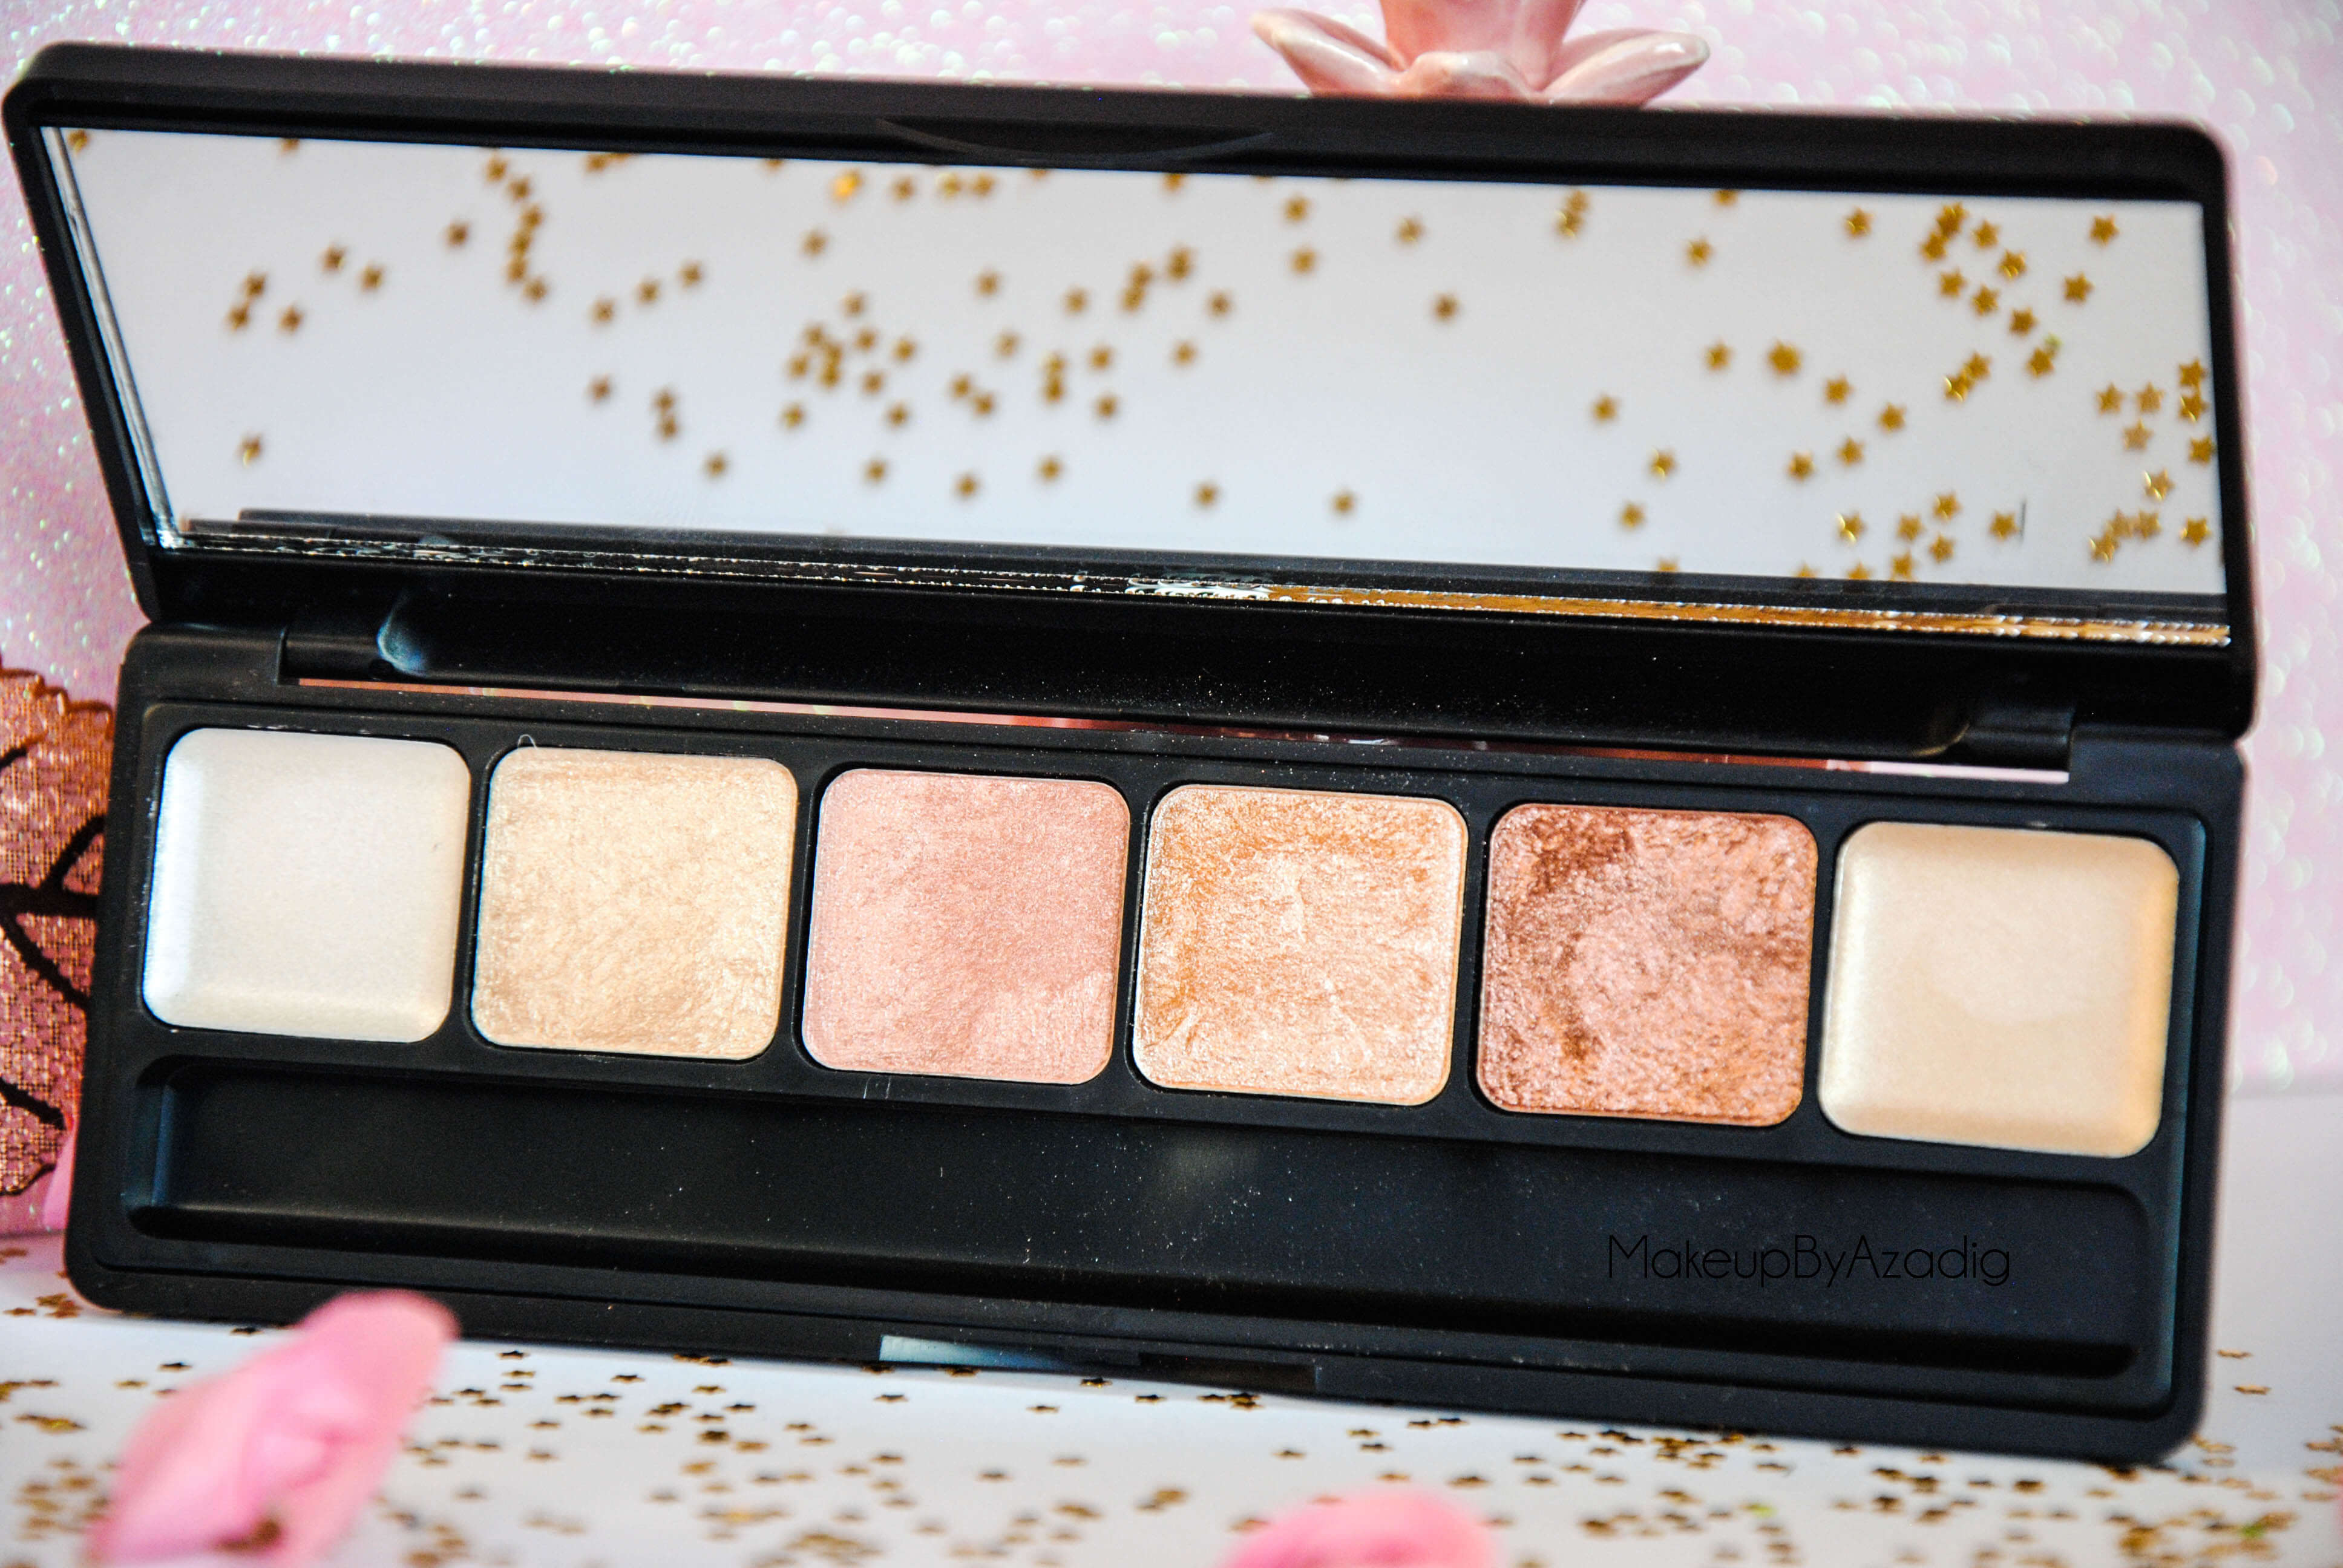 palette-eyeshadow-sleek-makeup-diamonds-in-the-rough-ilust-sephora-paris-makeupbyazadig-noel-code-promo-avis-prix-swatch